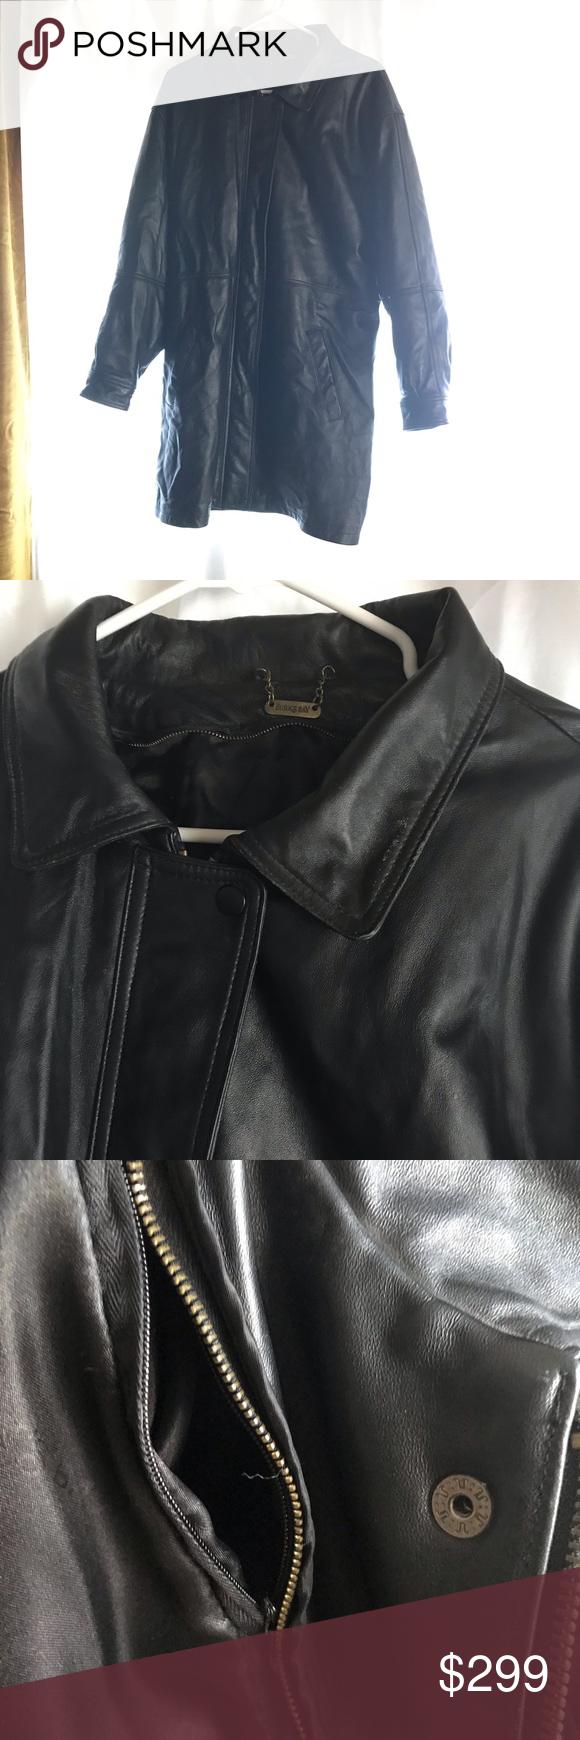 Matrix Genuine Leather Long Jacket Concealed Carry Long